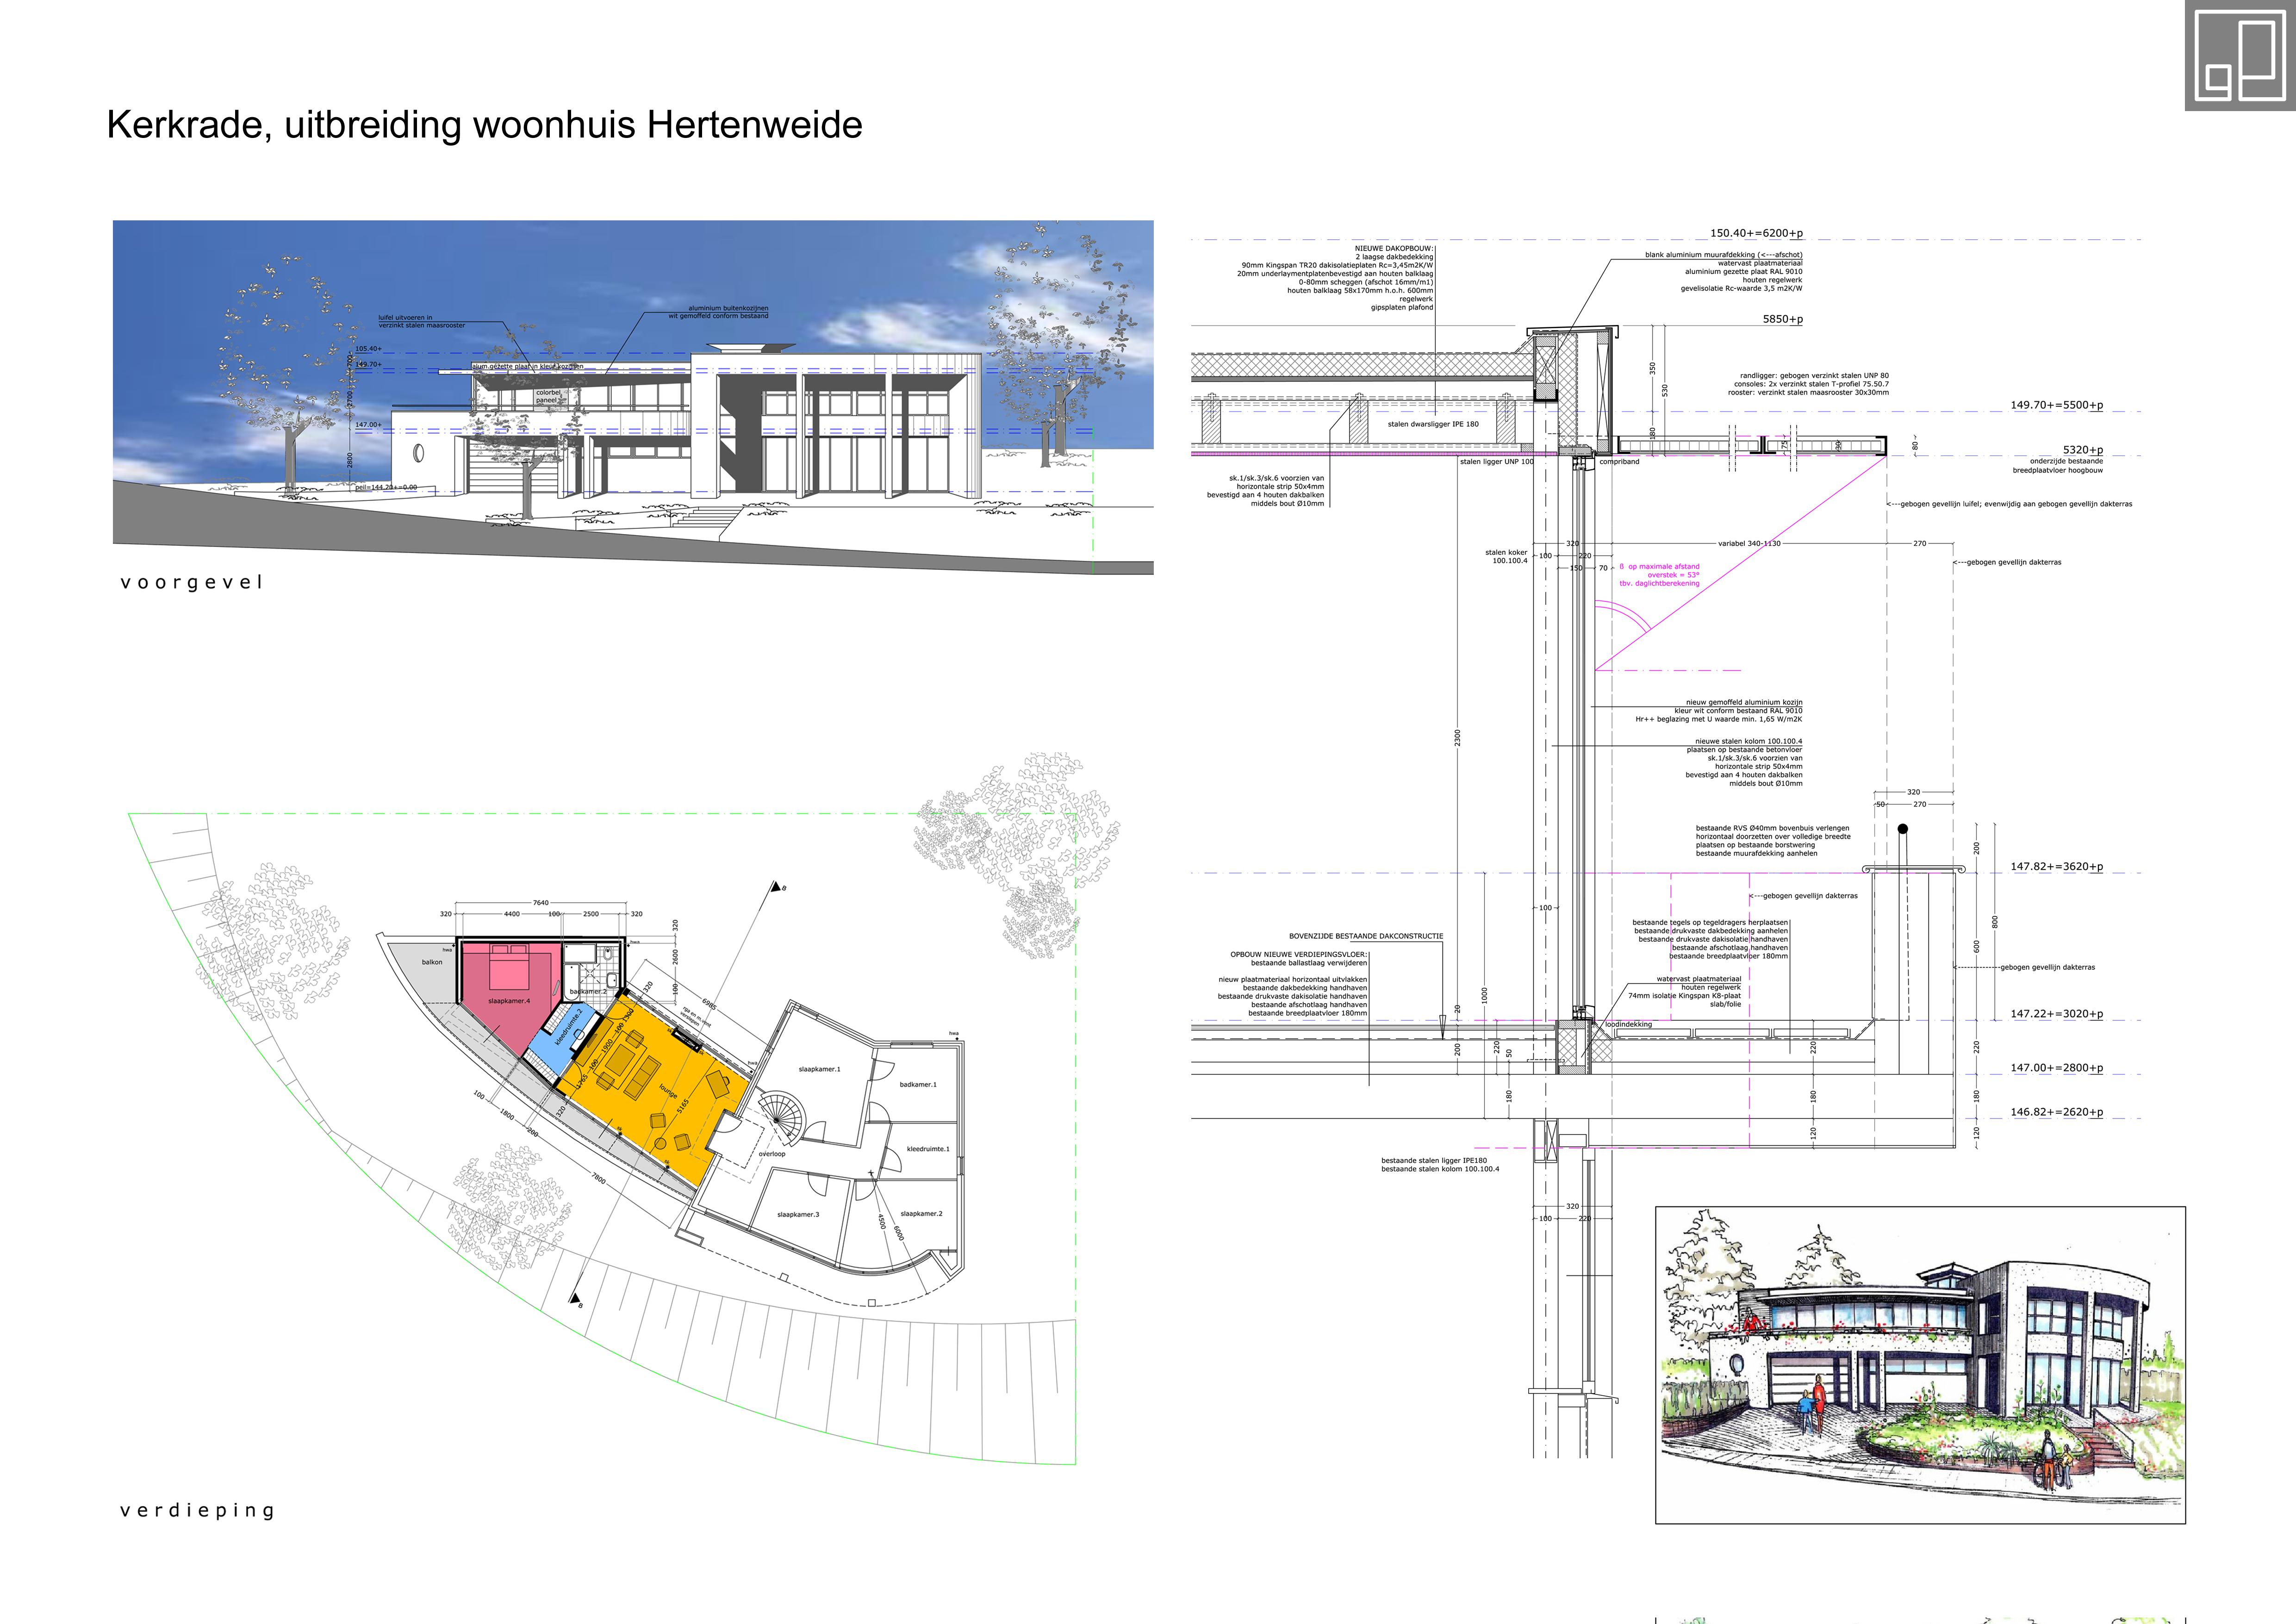 Uitbreiding woonhuis Kerkrade